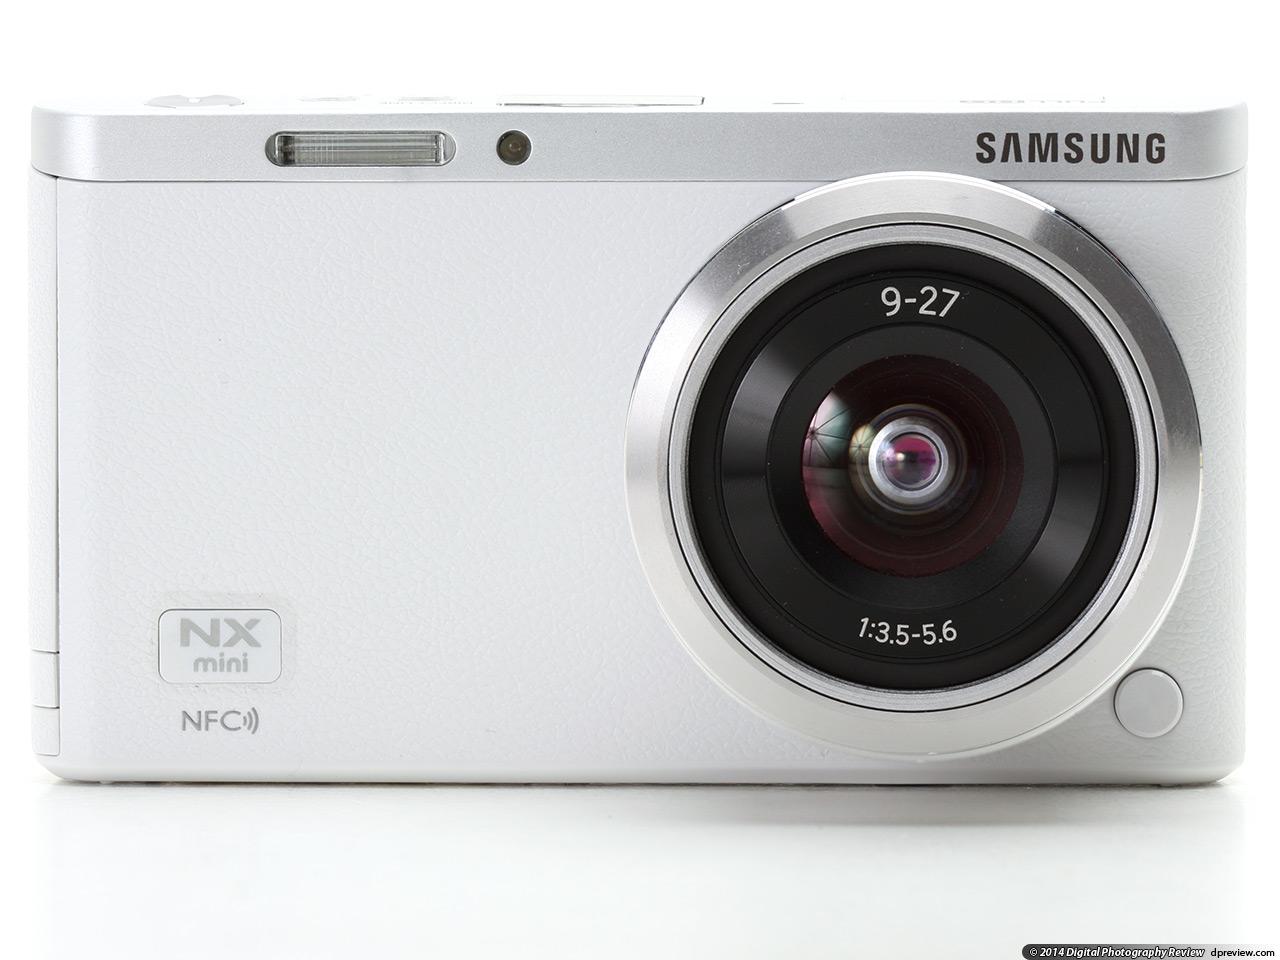 Piquant Samsung Nx Mini Review Samsung Nx Mini Digital Photography Review Samsung Camera Wifi Connection Samsung Camera Wifi Auto Backup dpreview Samsung Camera Wifi